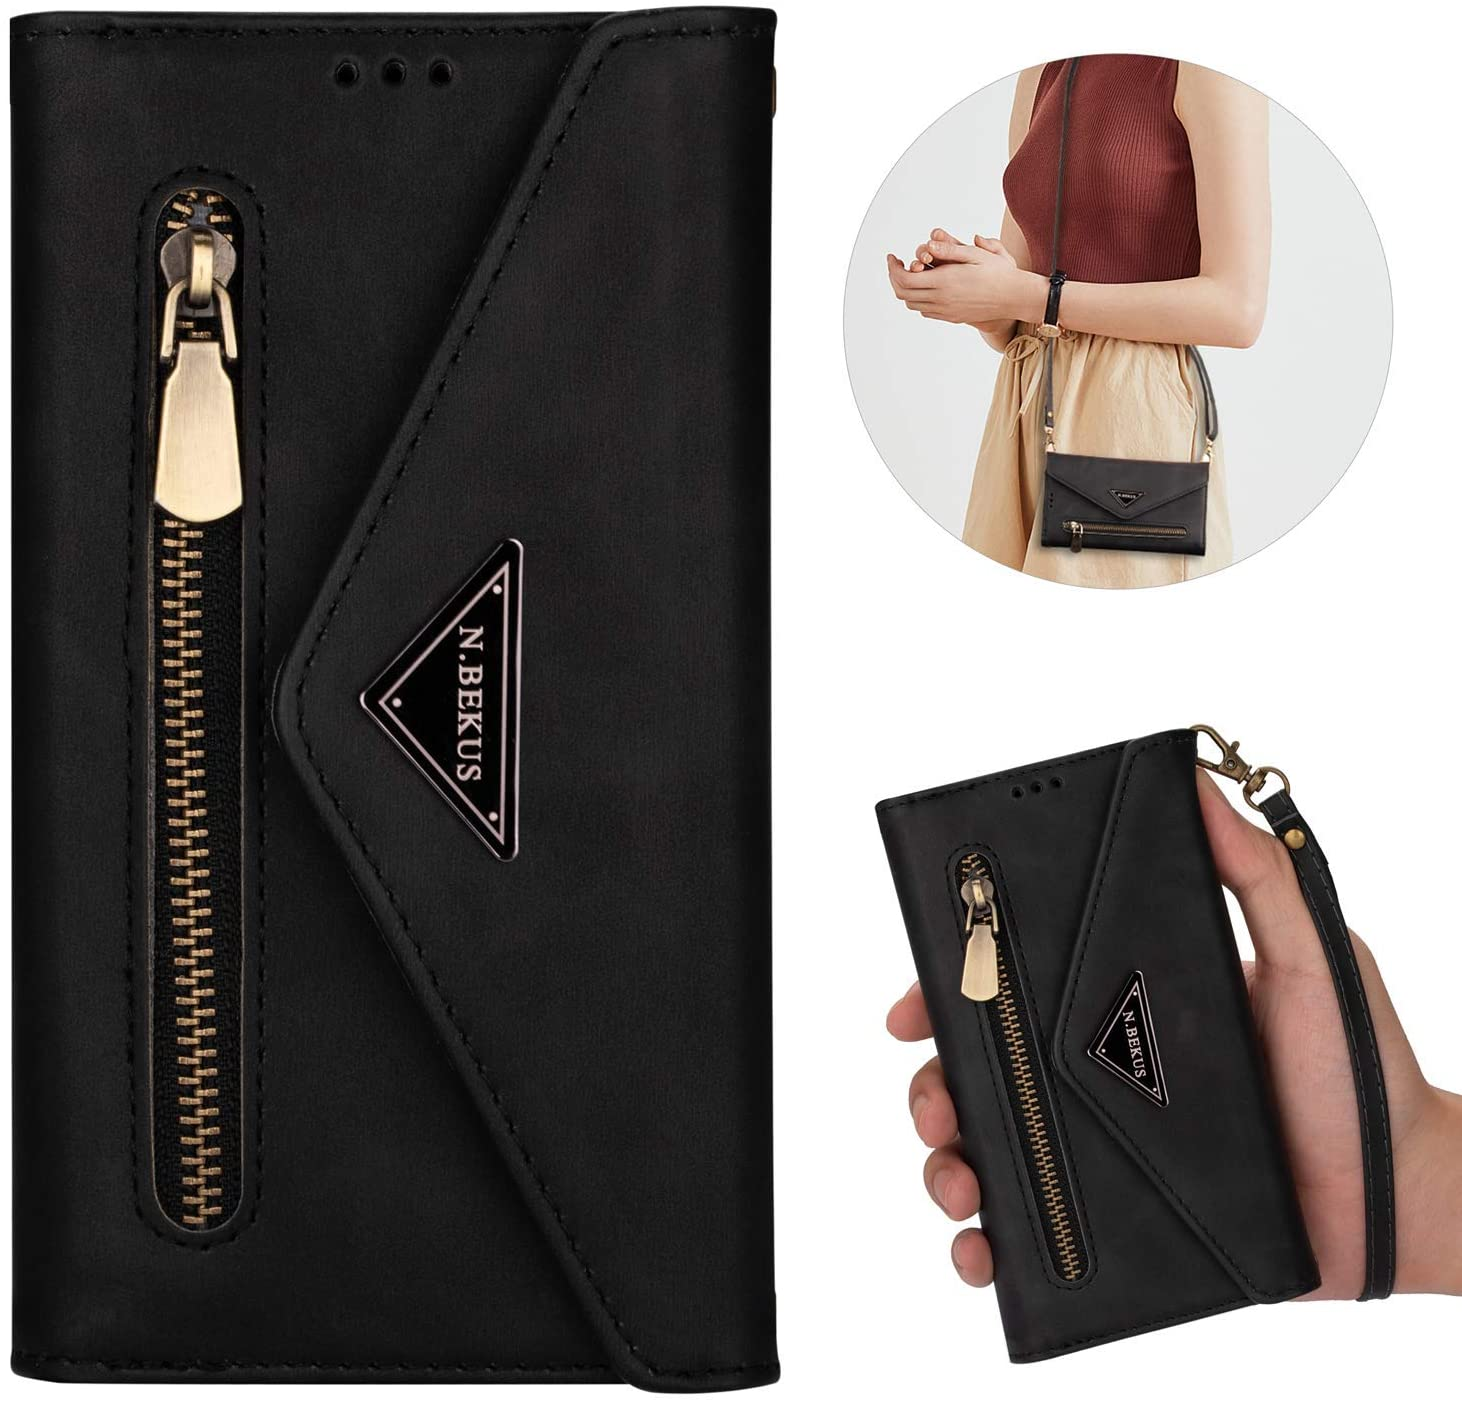 PHEZEN Crossbody Phone Case for iPhone 6S Plus / 6 Plus Wallet Case with Credit Card Holder Case Crossbody Strap Handbag Purse Zipper Flip Case Protective Cover for iPhone 6 Plus/6S Plus Black